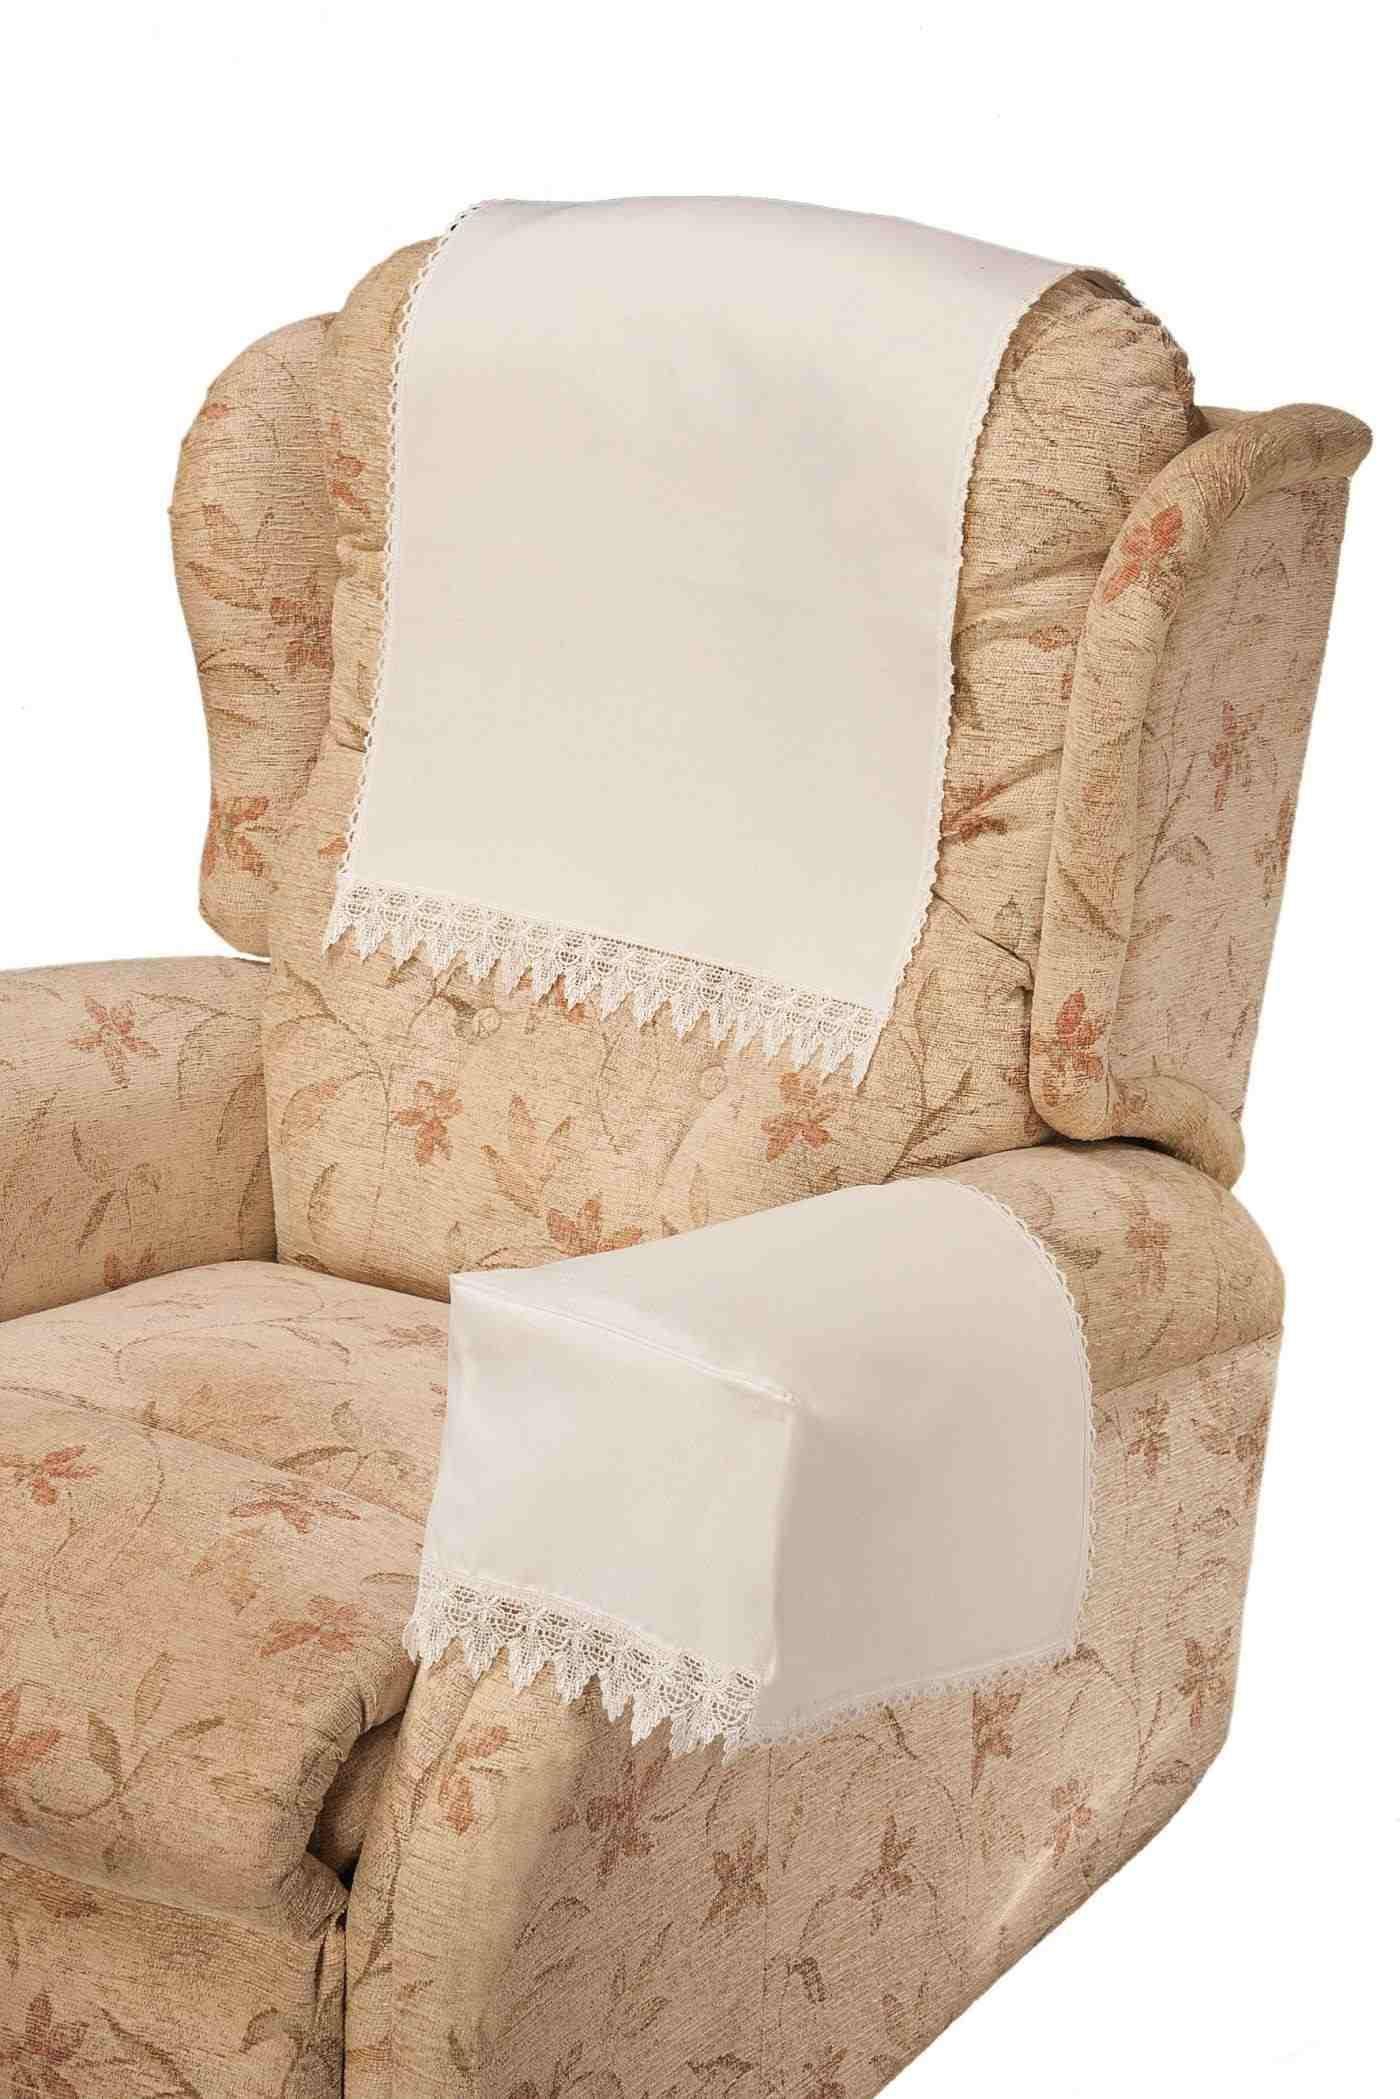 Crochet Sofa Arm Covers Photo 1 Of 5 Crochet Chair Back Covers Crochet Armchair Covers Amazing Ideas 1 Sofa Arm Covers Arm Chair Covers Patterned Chair